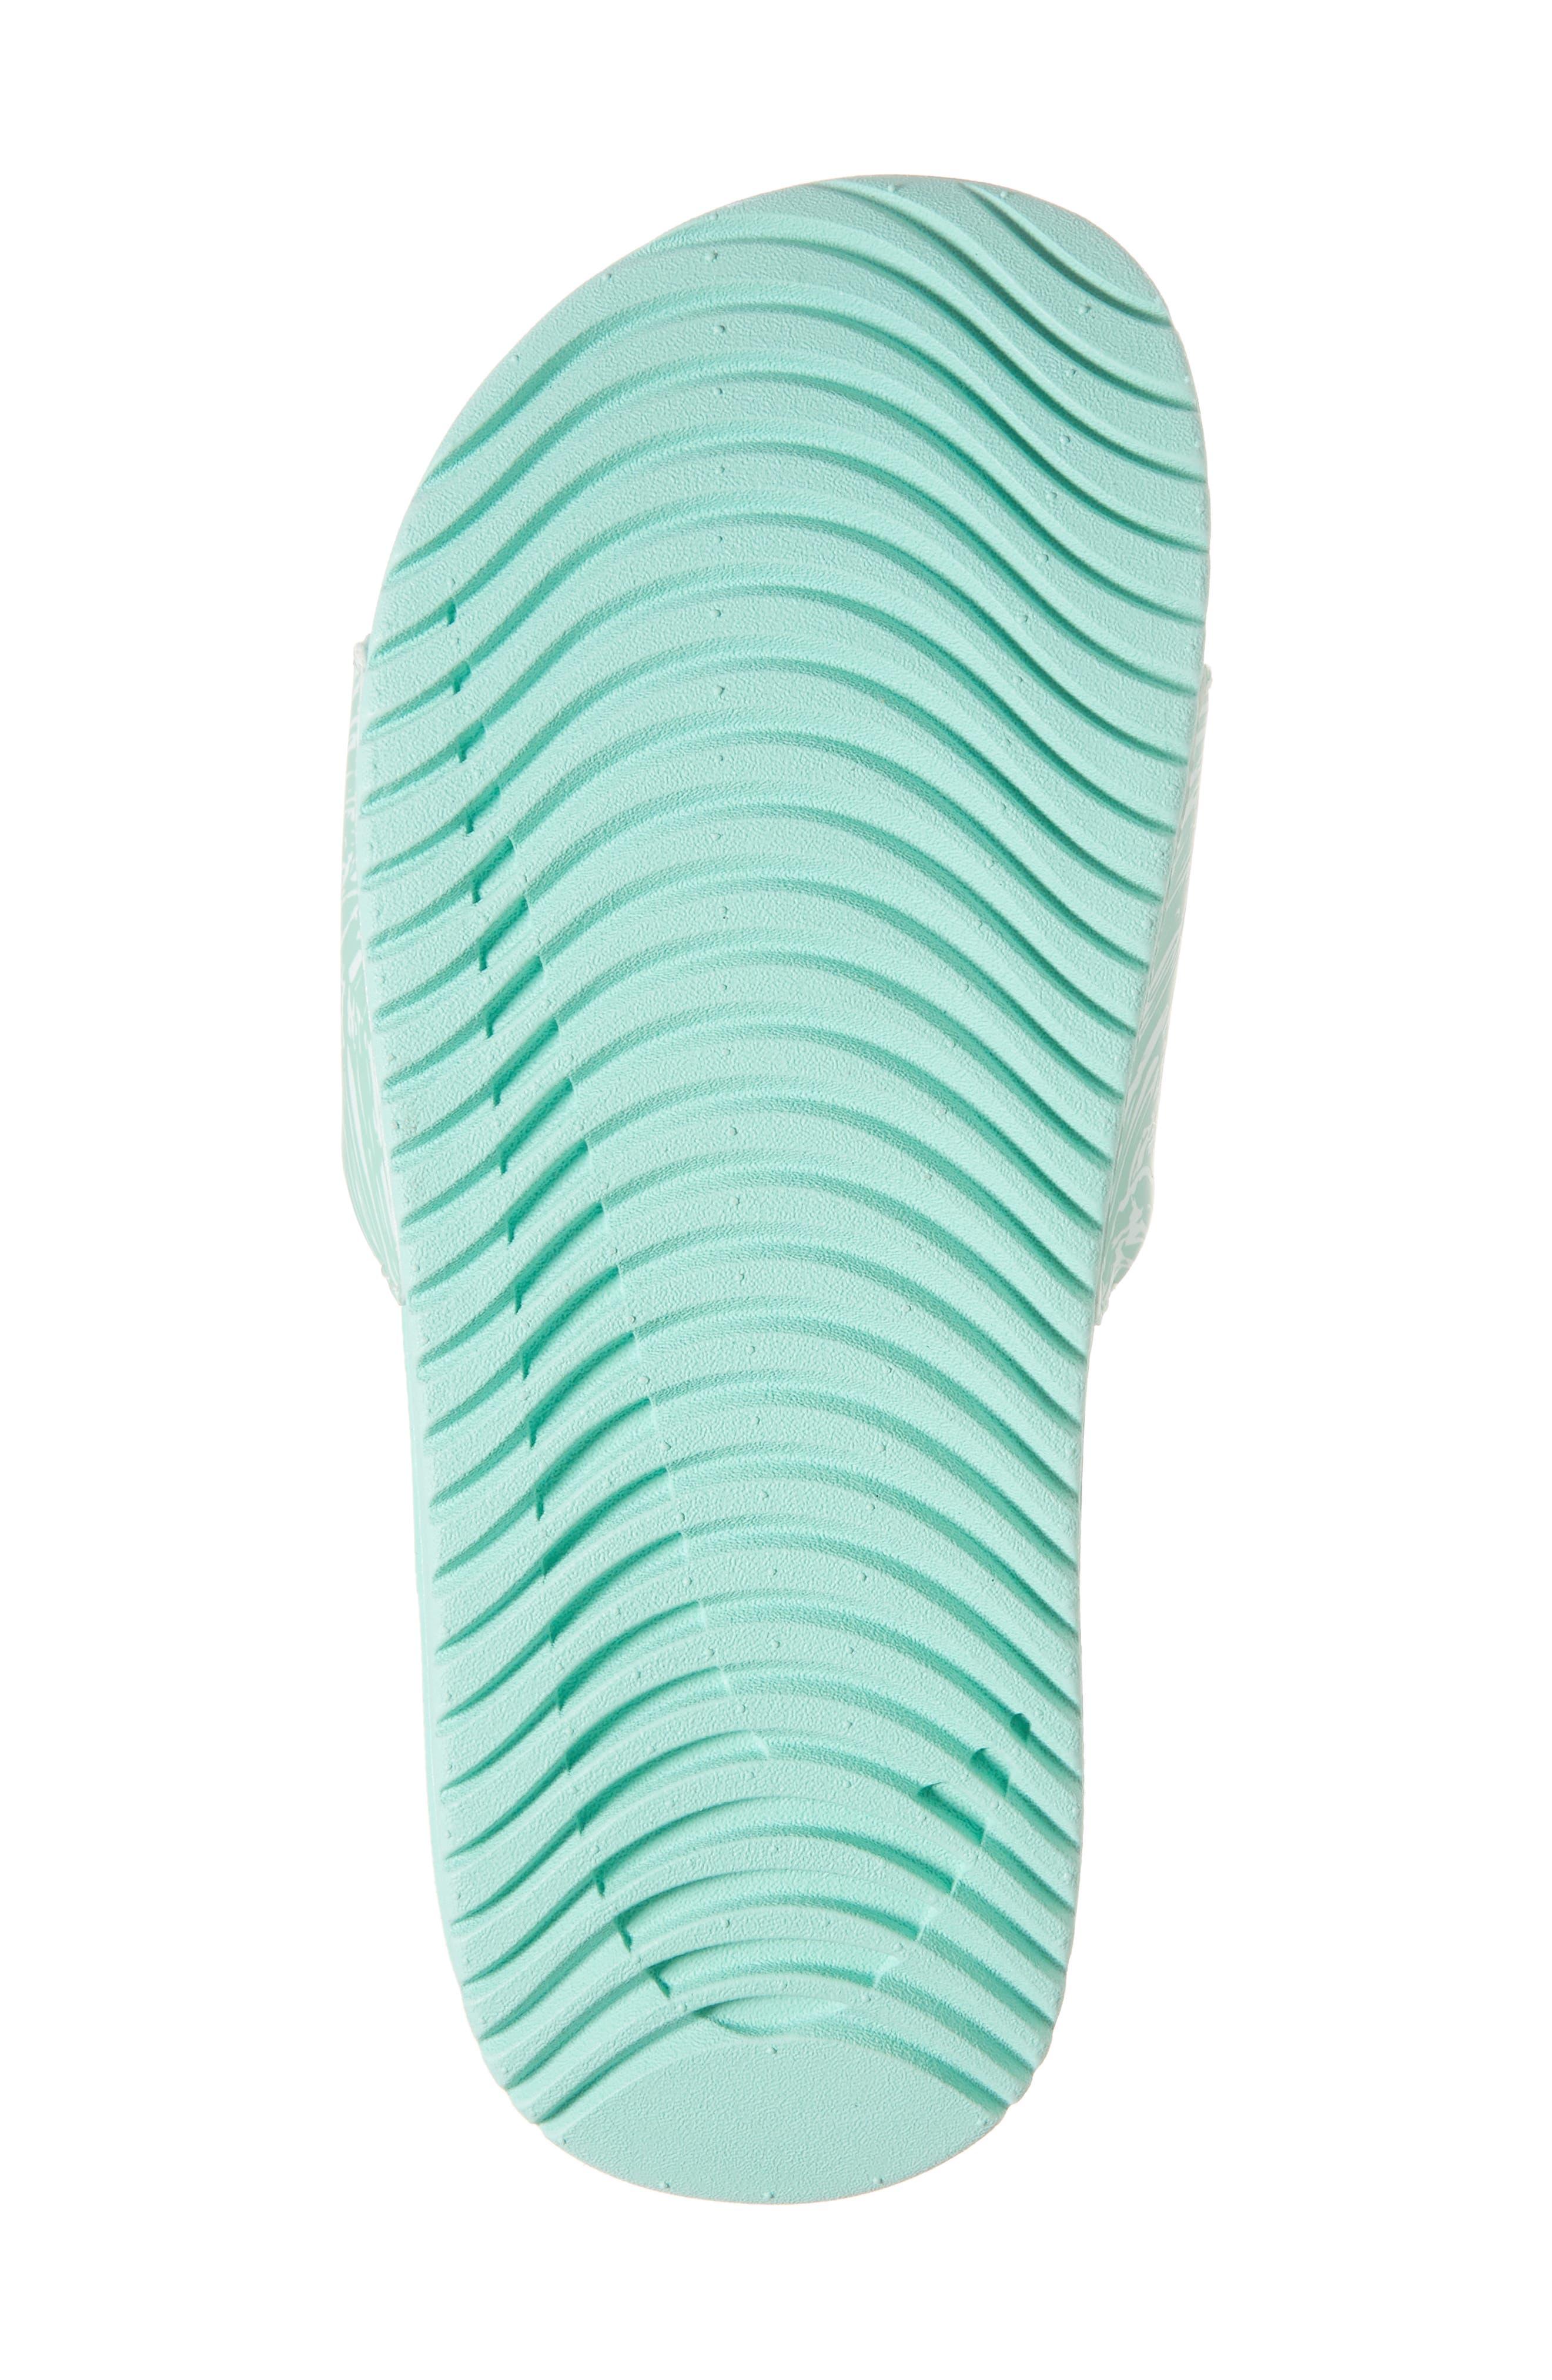 'Kawa' Print Slide Sandal,                             Alternate thumbnail 6, color,                             Emerald Rise/ White/ Igloo